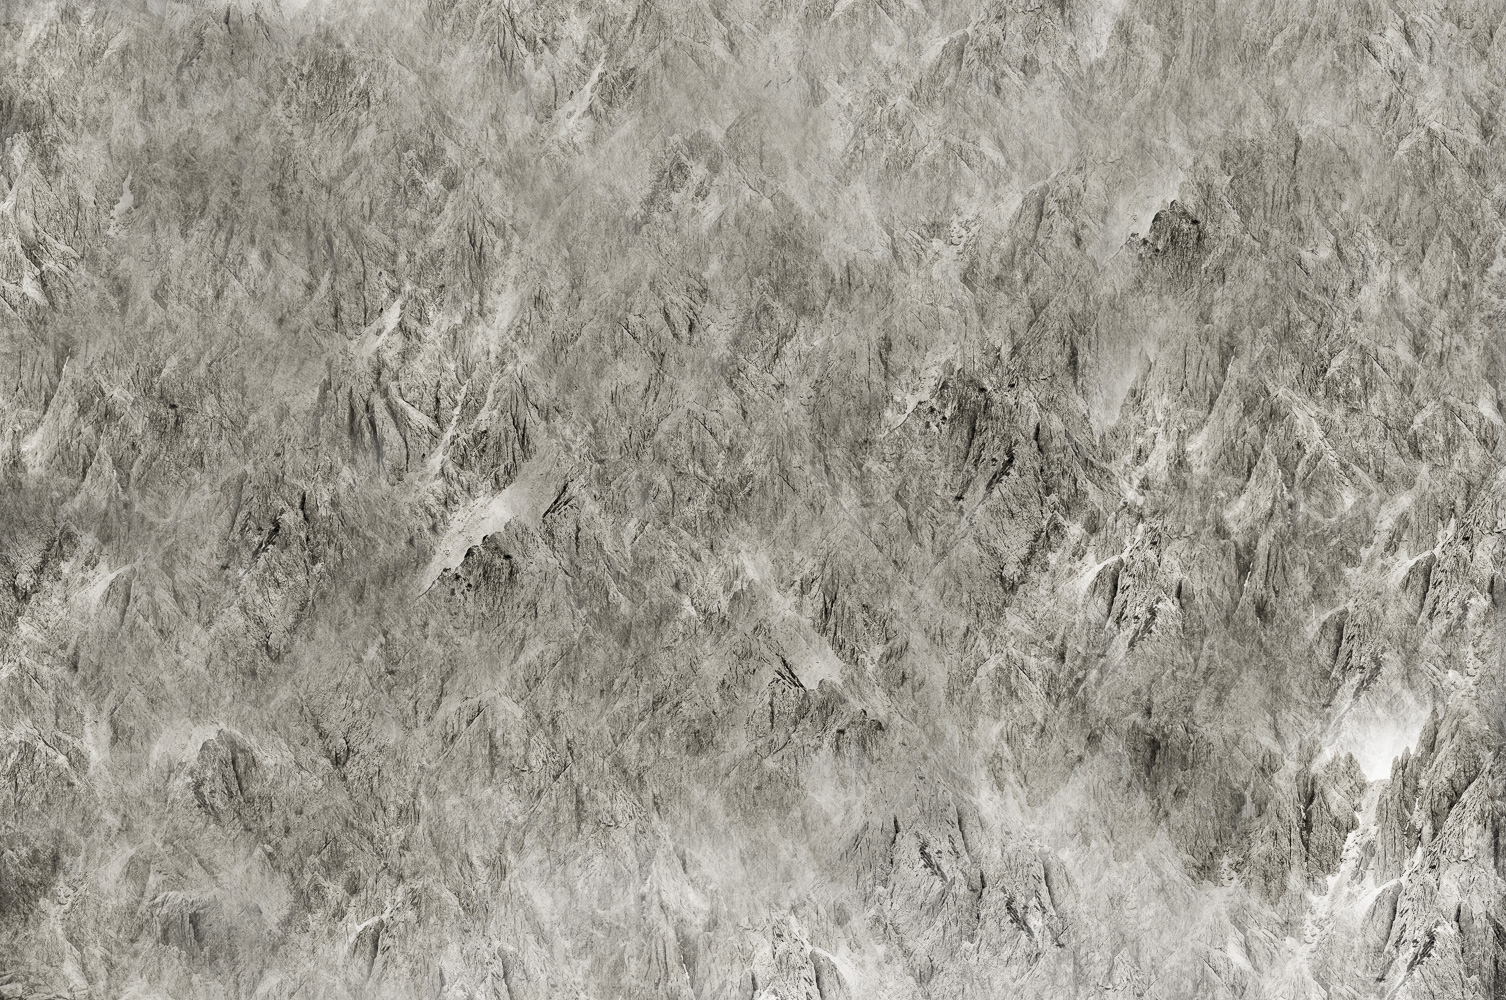 Moonscape Texture